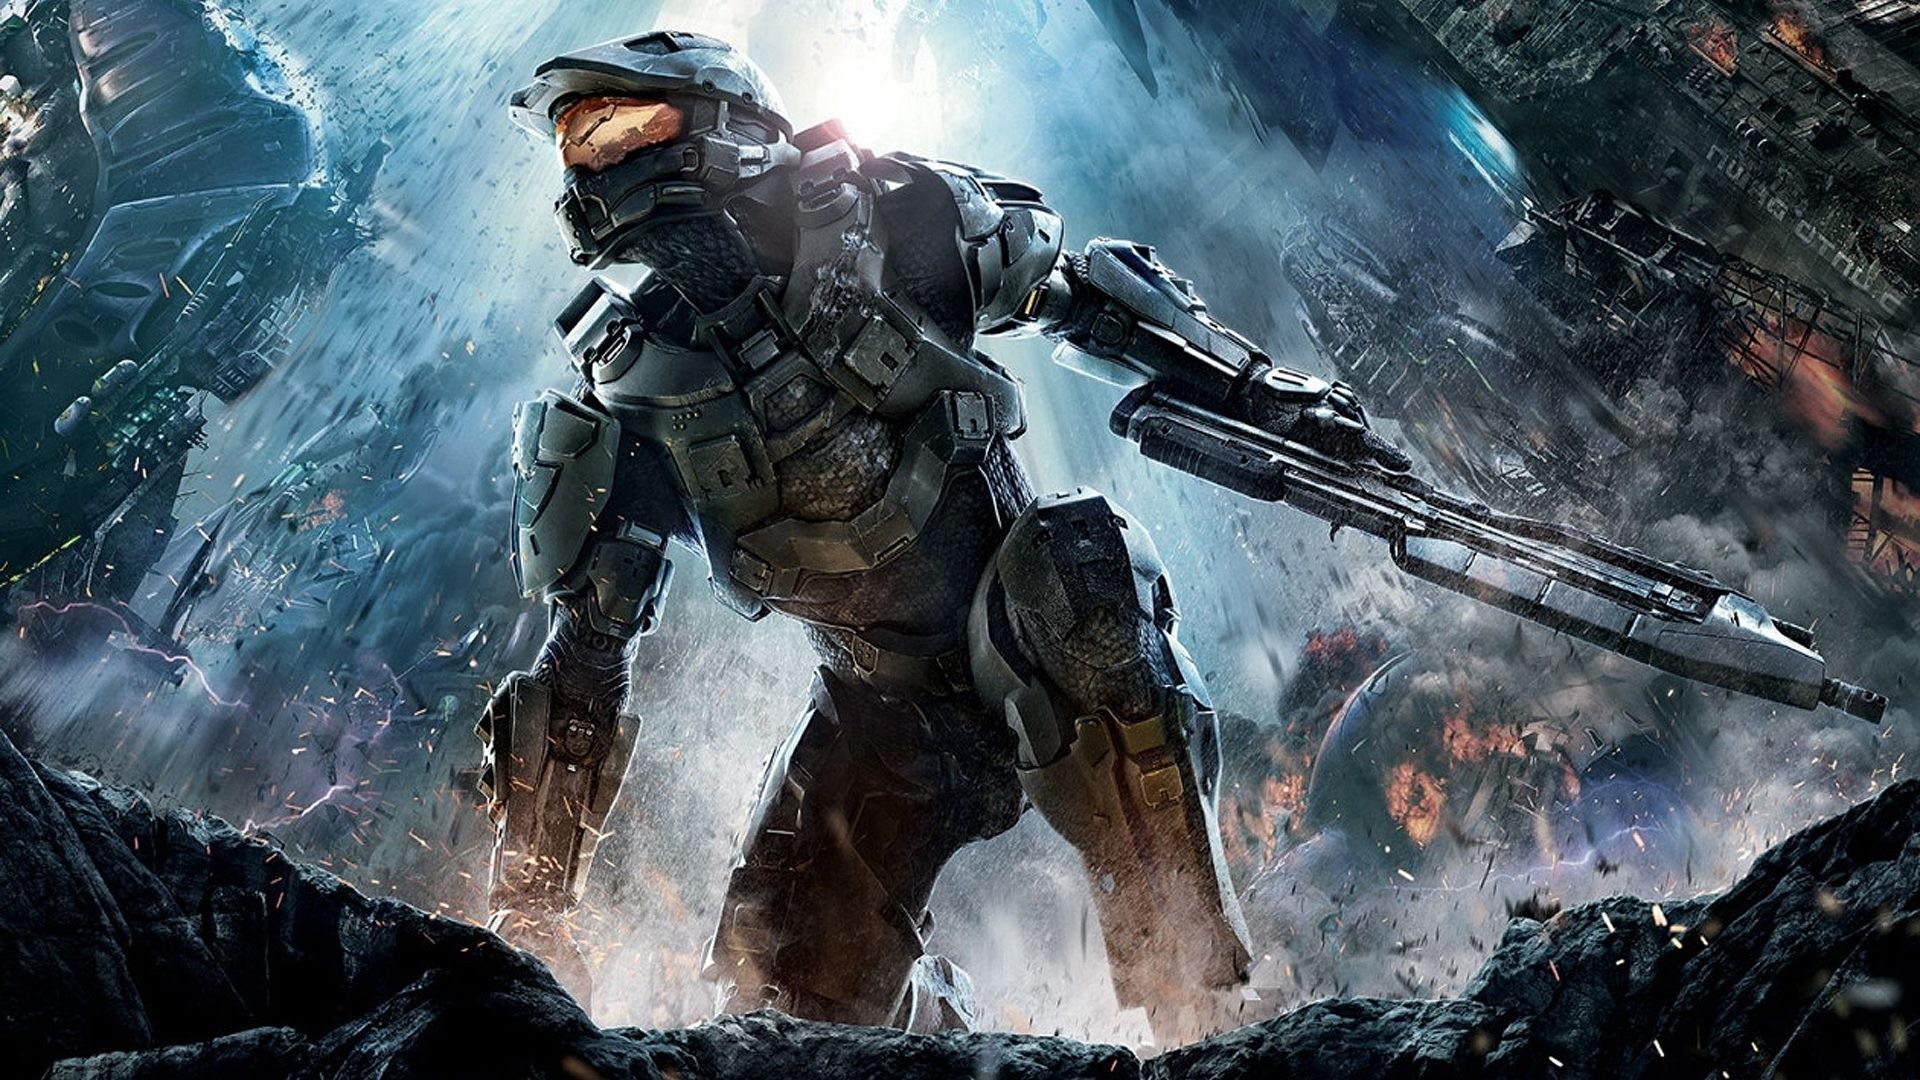 Halo 4 wallpaper #4018